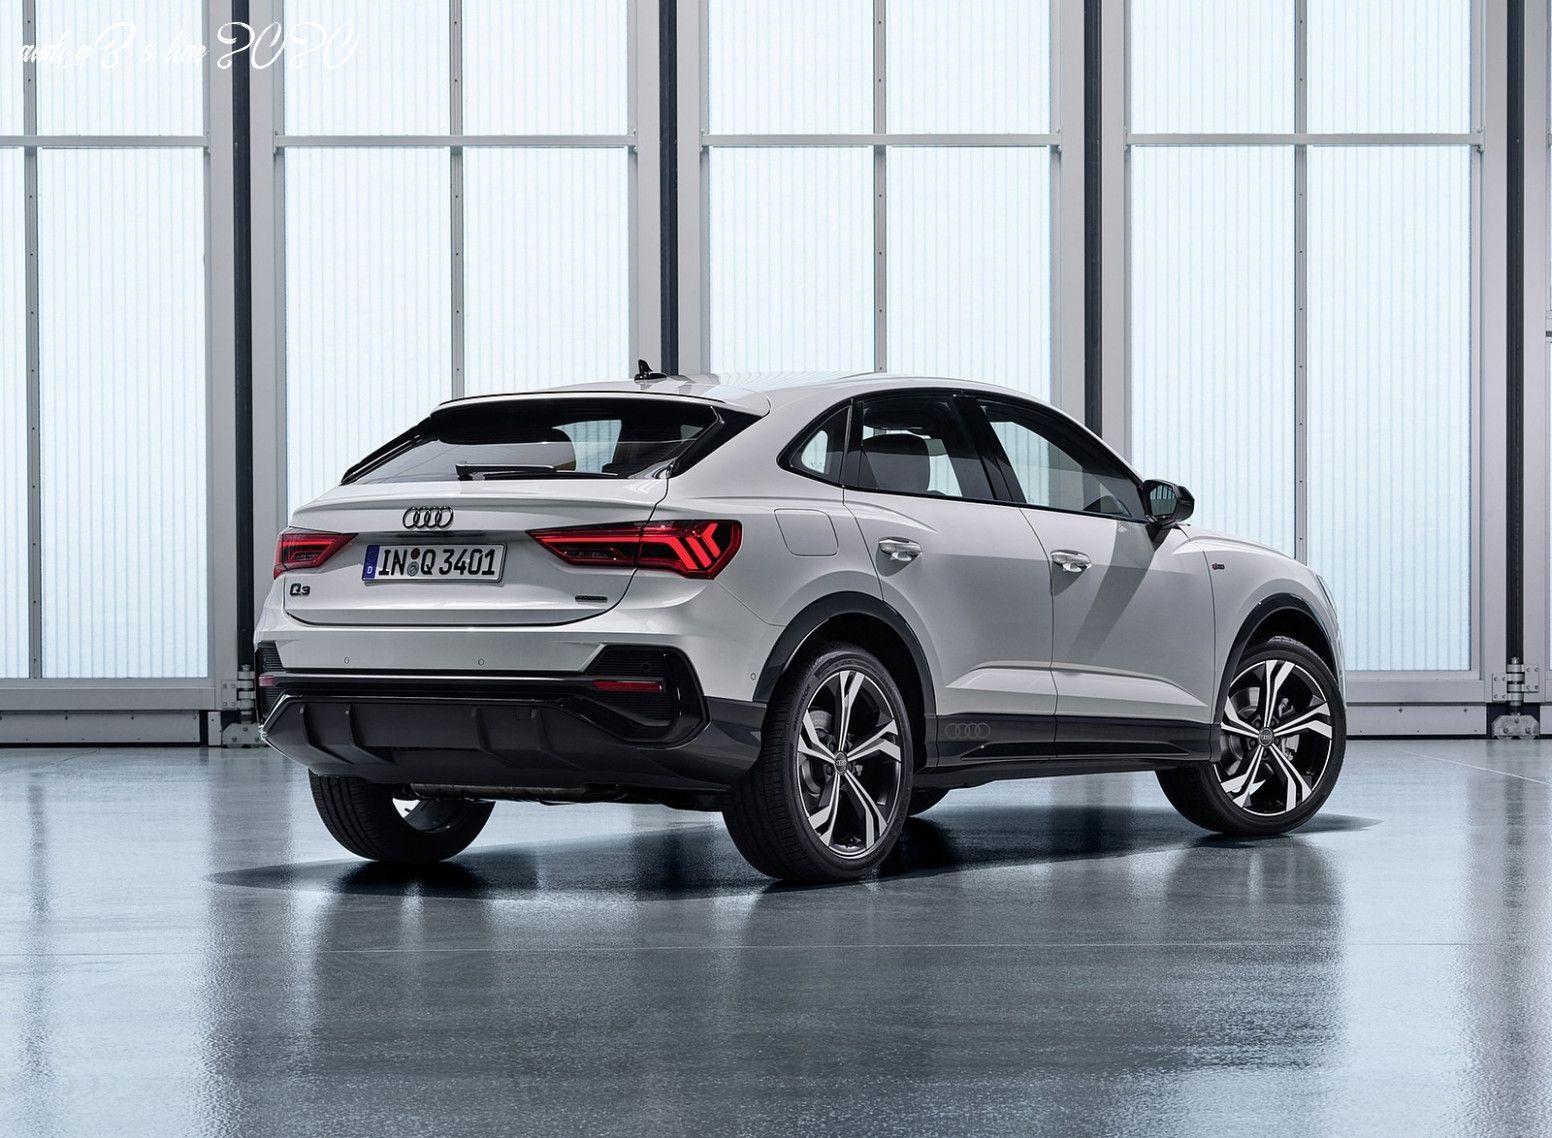 Audi Q3 S Line 2020 In 2020 Audi Q3 Audi Dream Cars